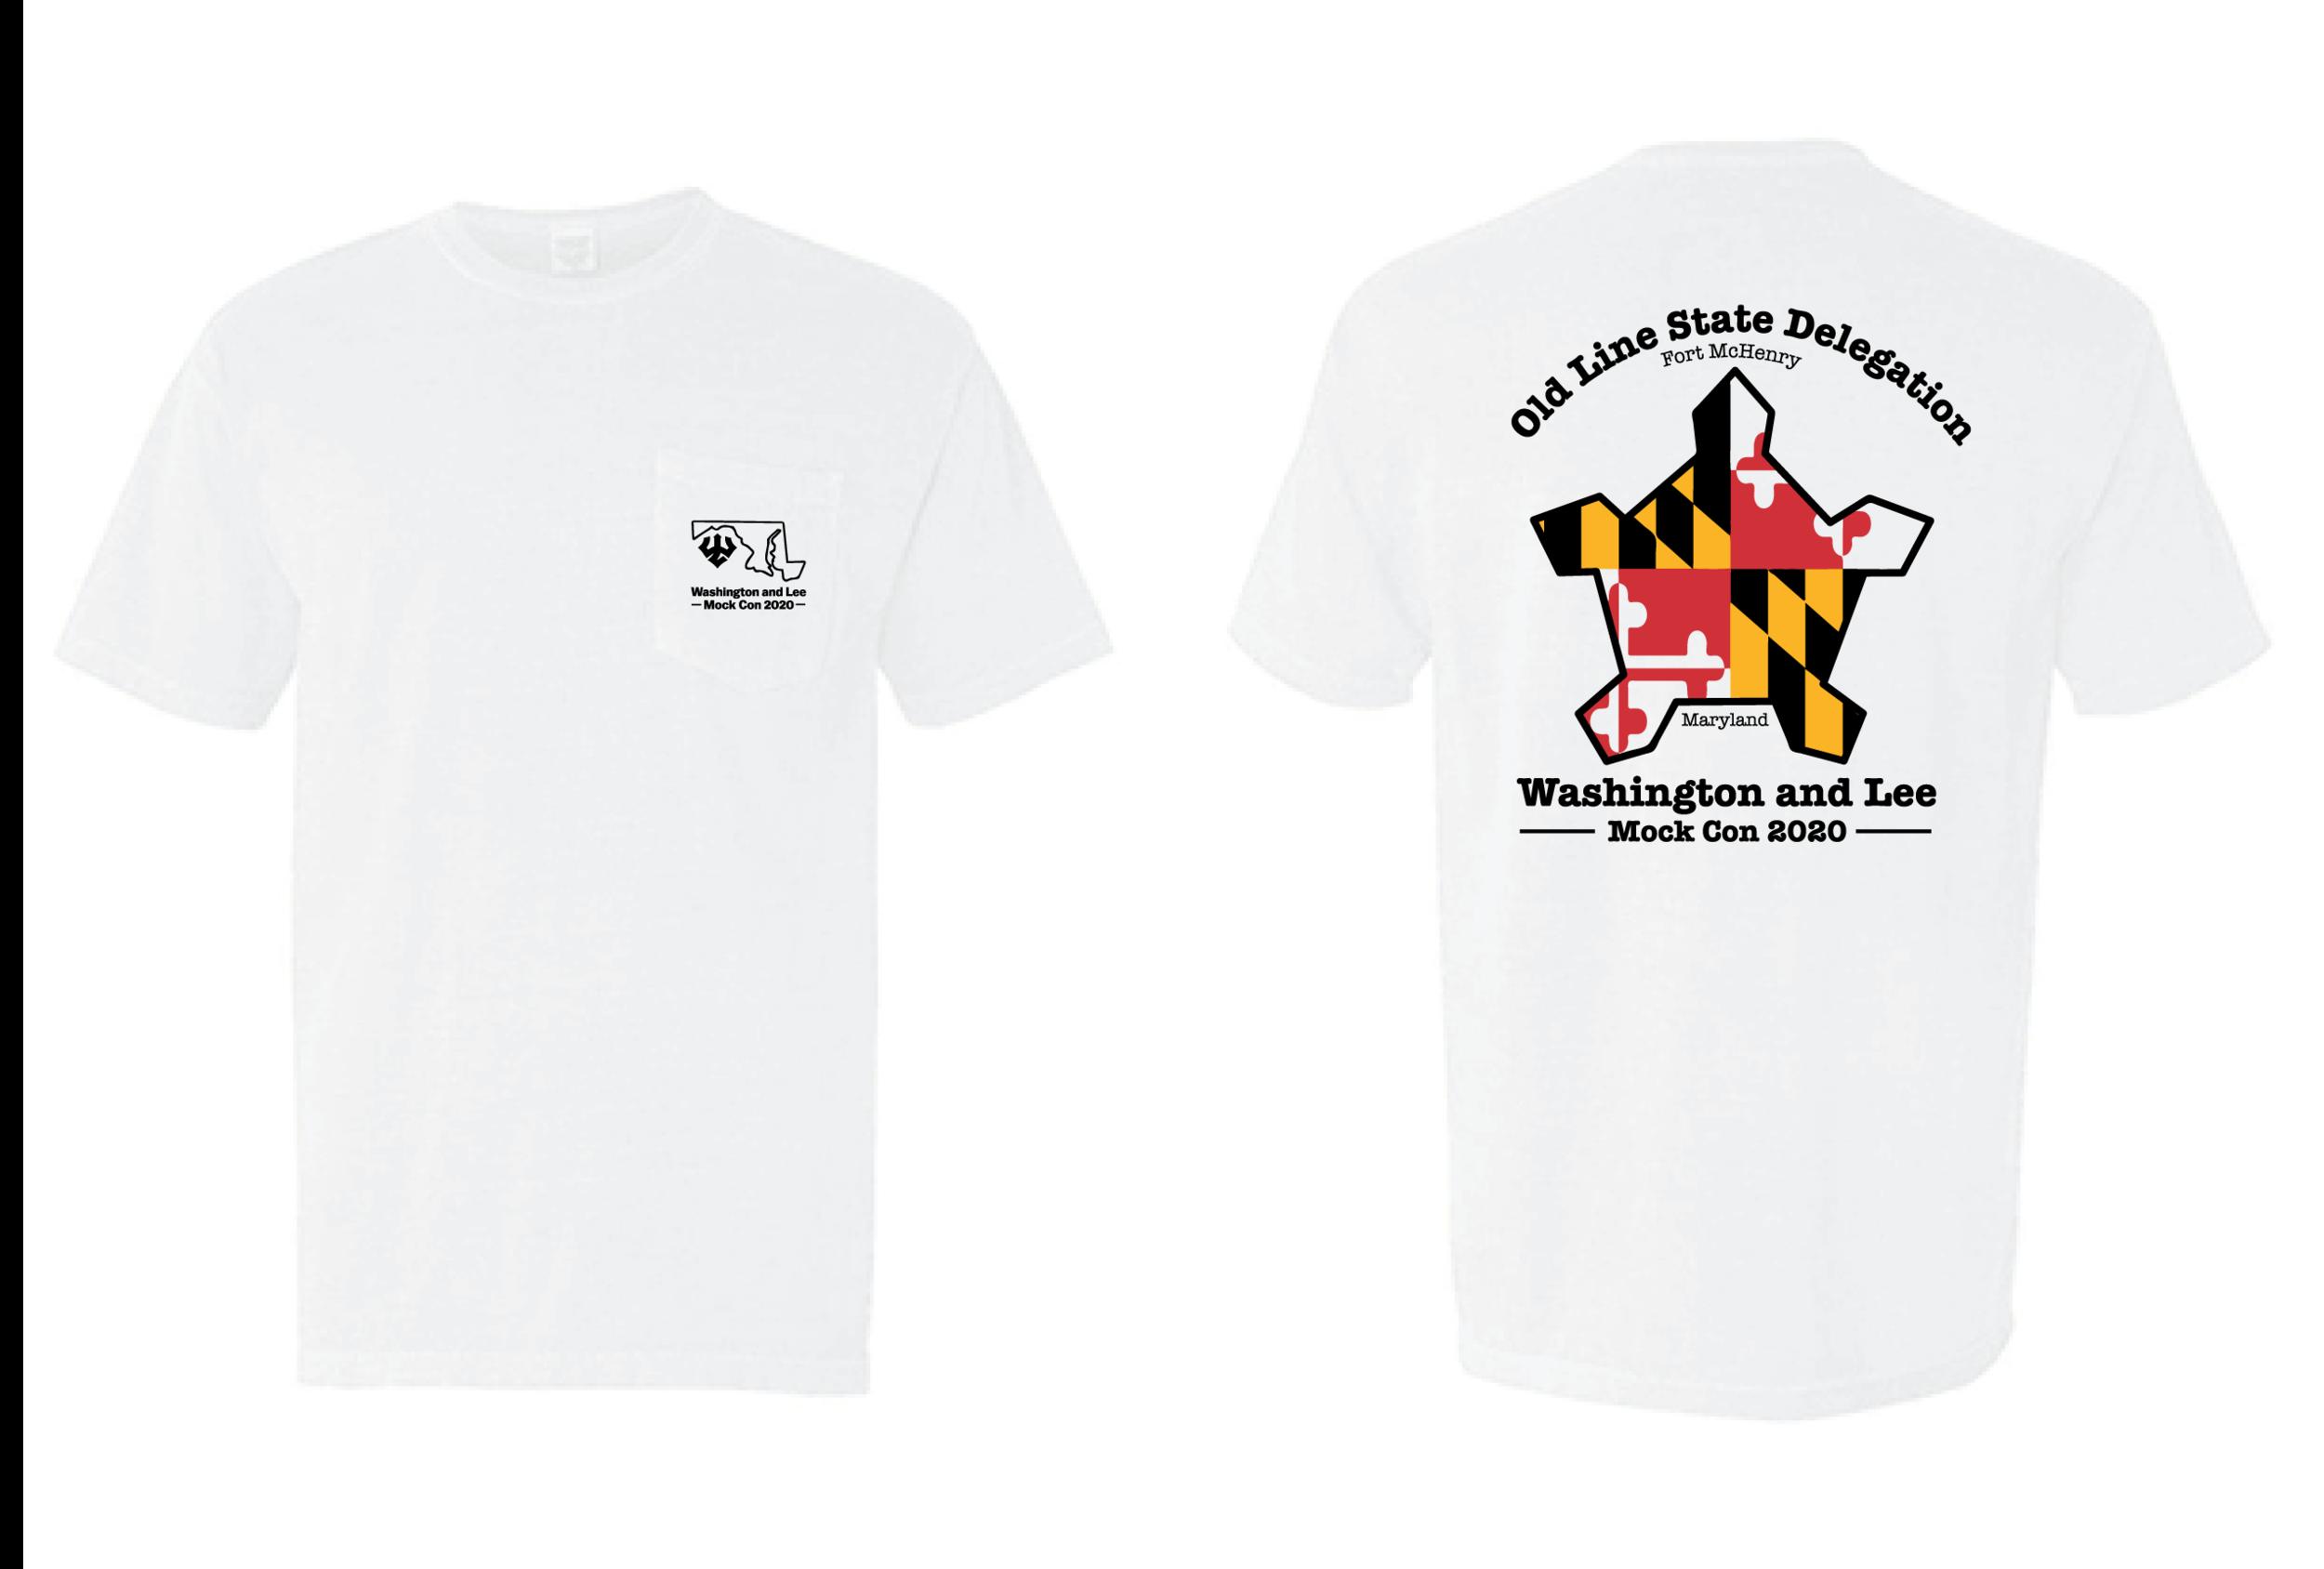 Maryland State Tee